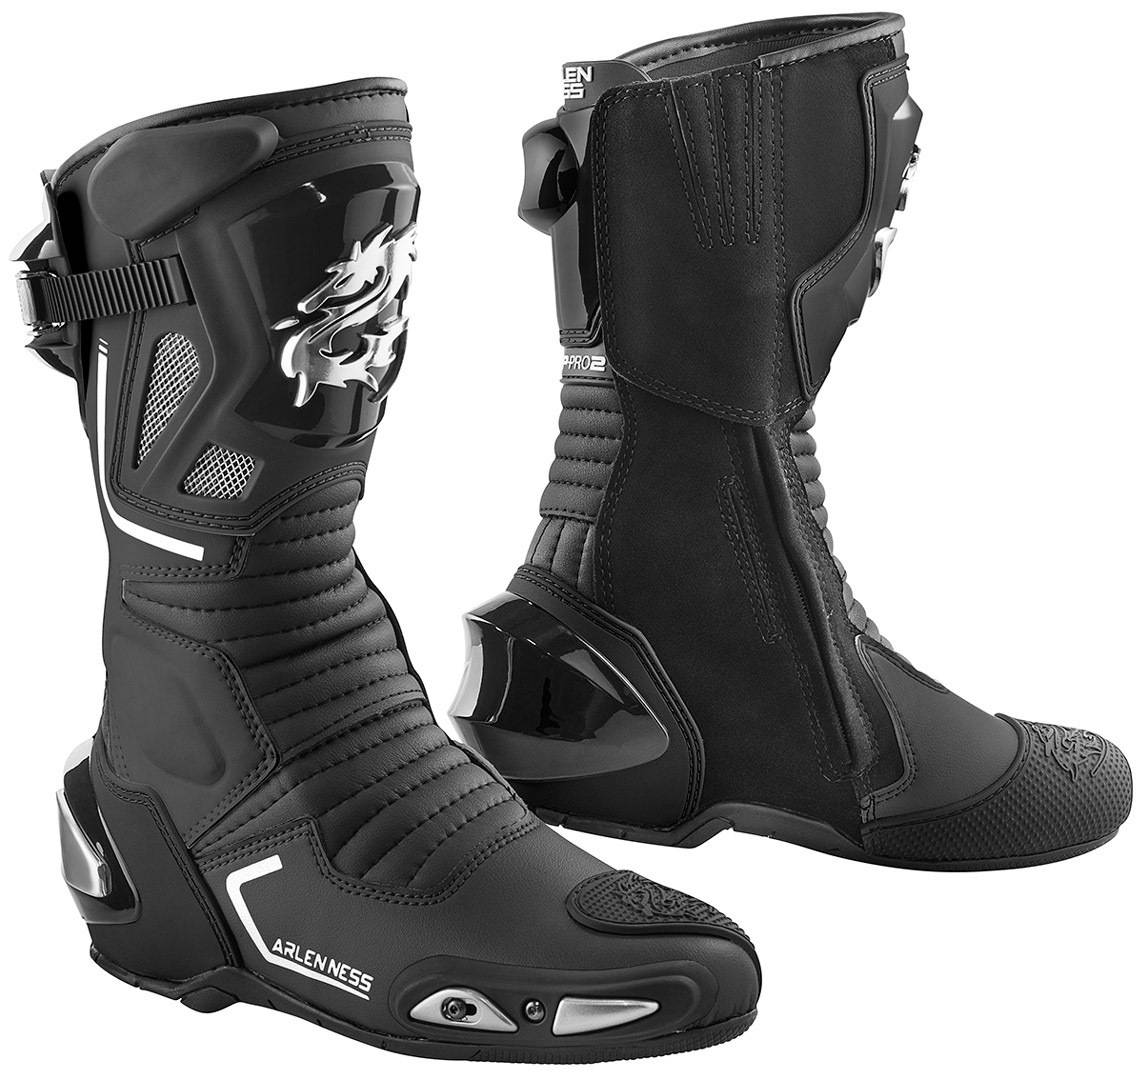 Arlen Ness Sugello Bottes de moto Noir taille : 40